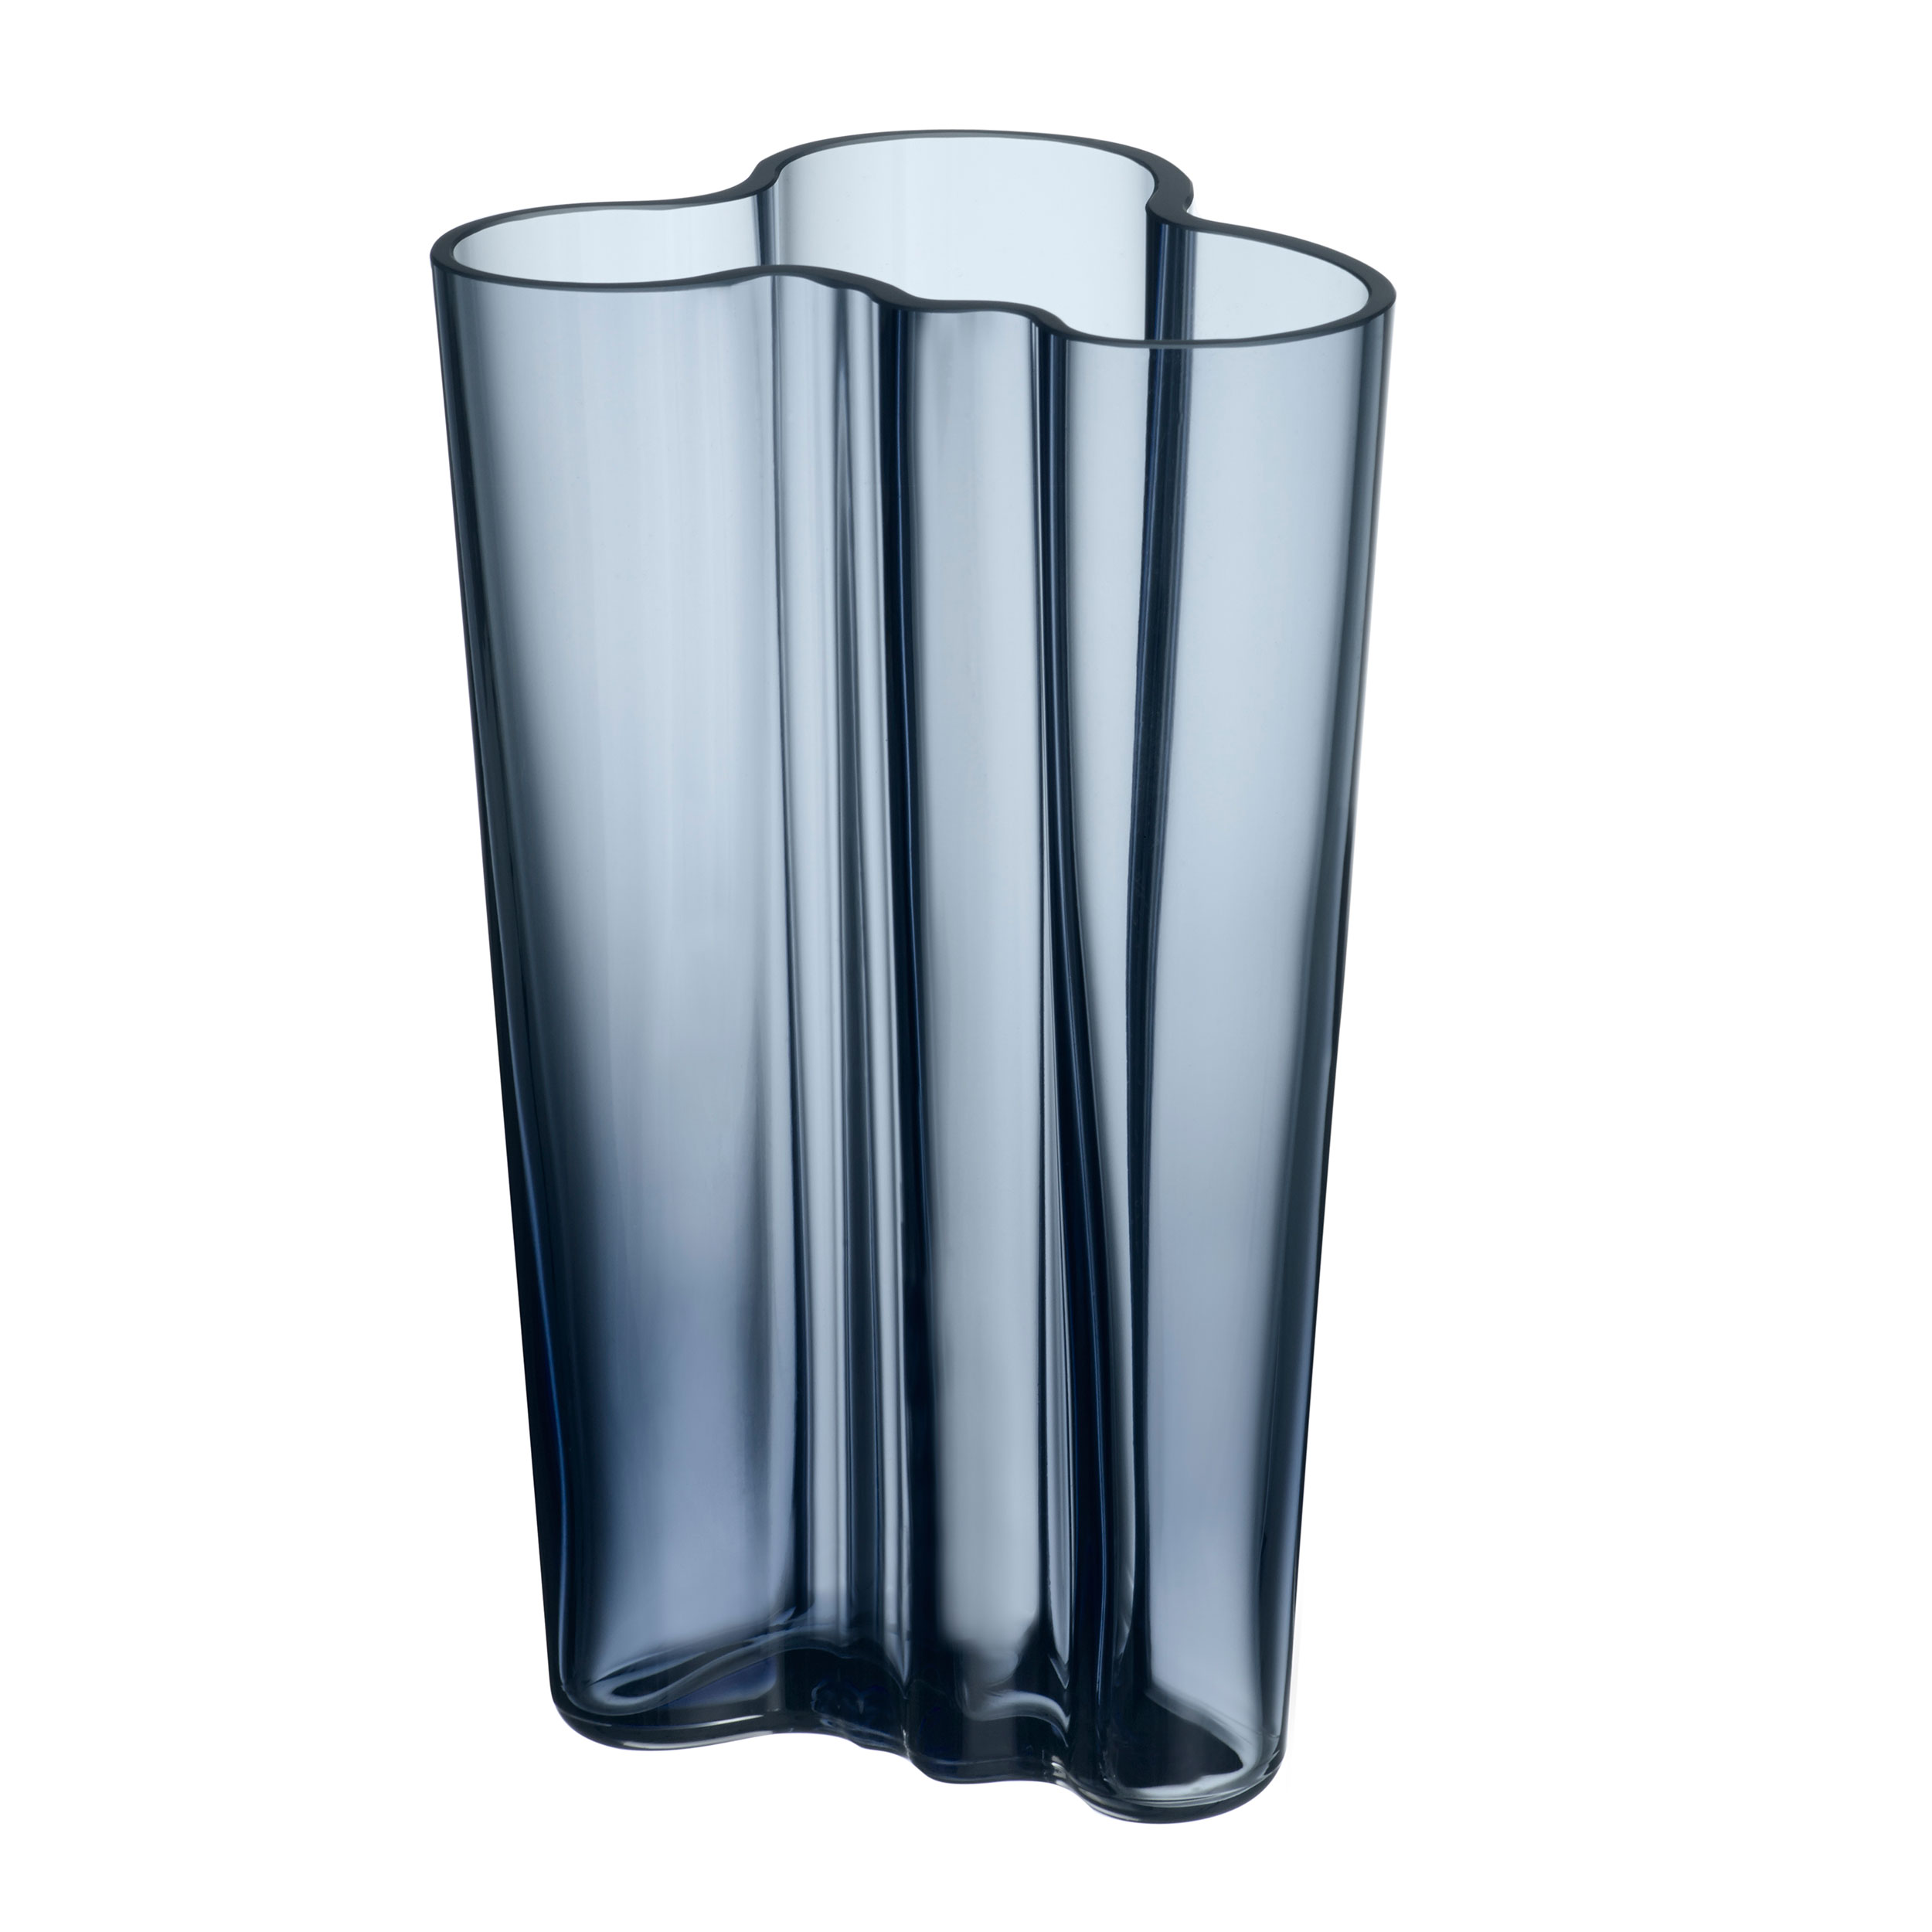 Iittala Alvar Aalto Collection Finlandia Vase Flower Vase Indoor Vase Table Vase Vase Glass Rain 20 1 Cm 1007826 At About Tea De Shop